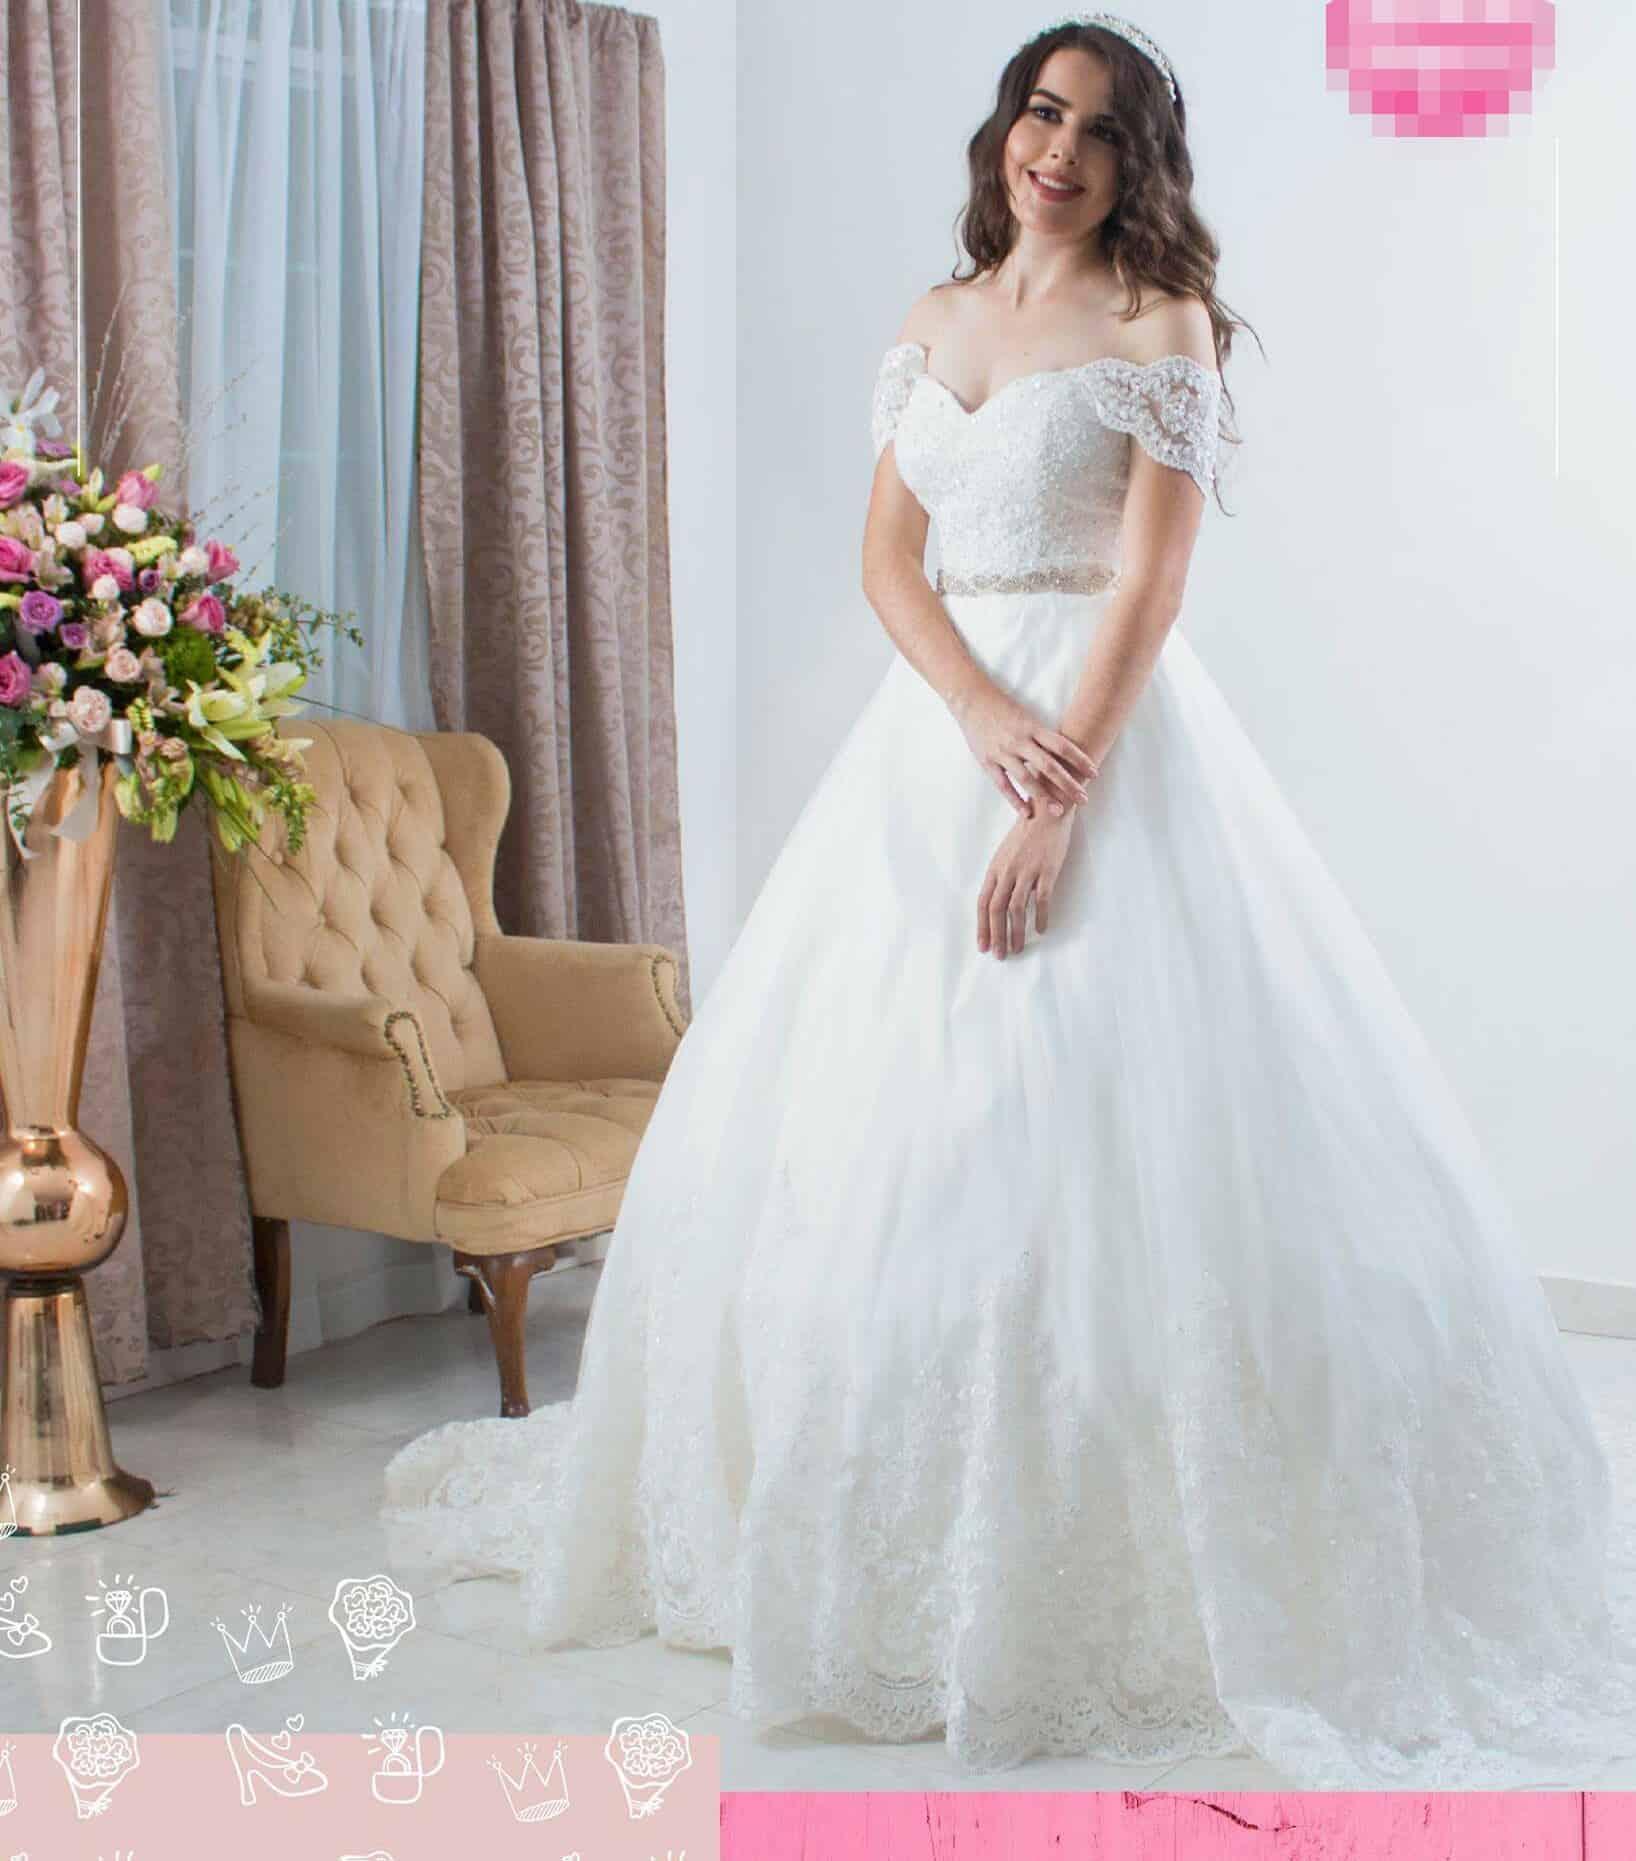 Groß Comprar Vestido Novia Segunda Mano Galerie - Hochzeit Kleid ...